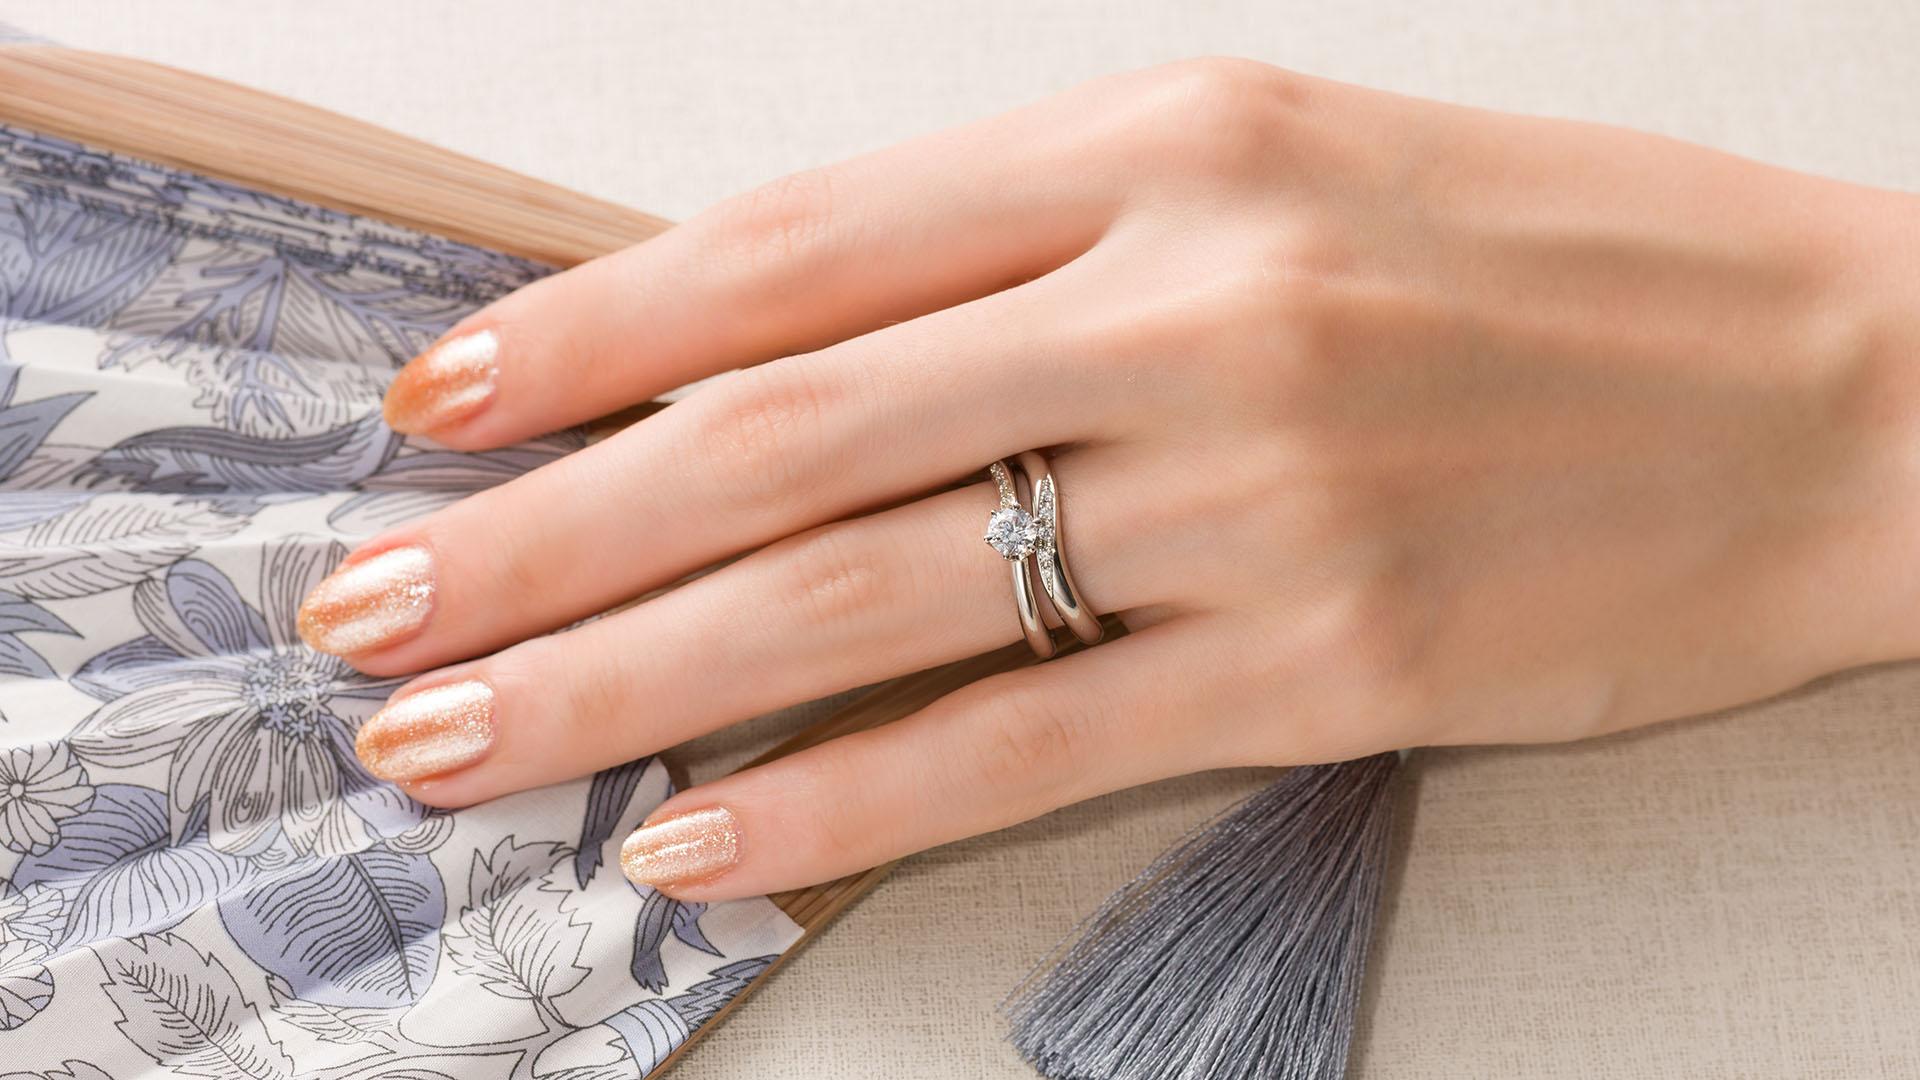 uranus ウラヌス | 結婚指輪サムネイル 2